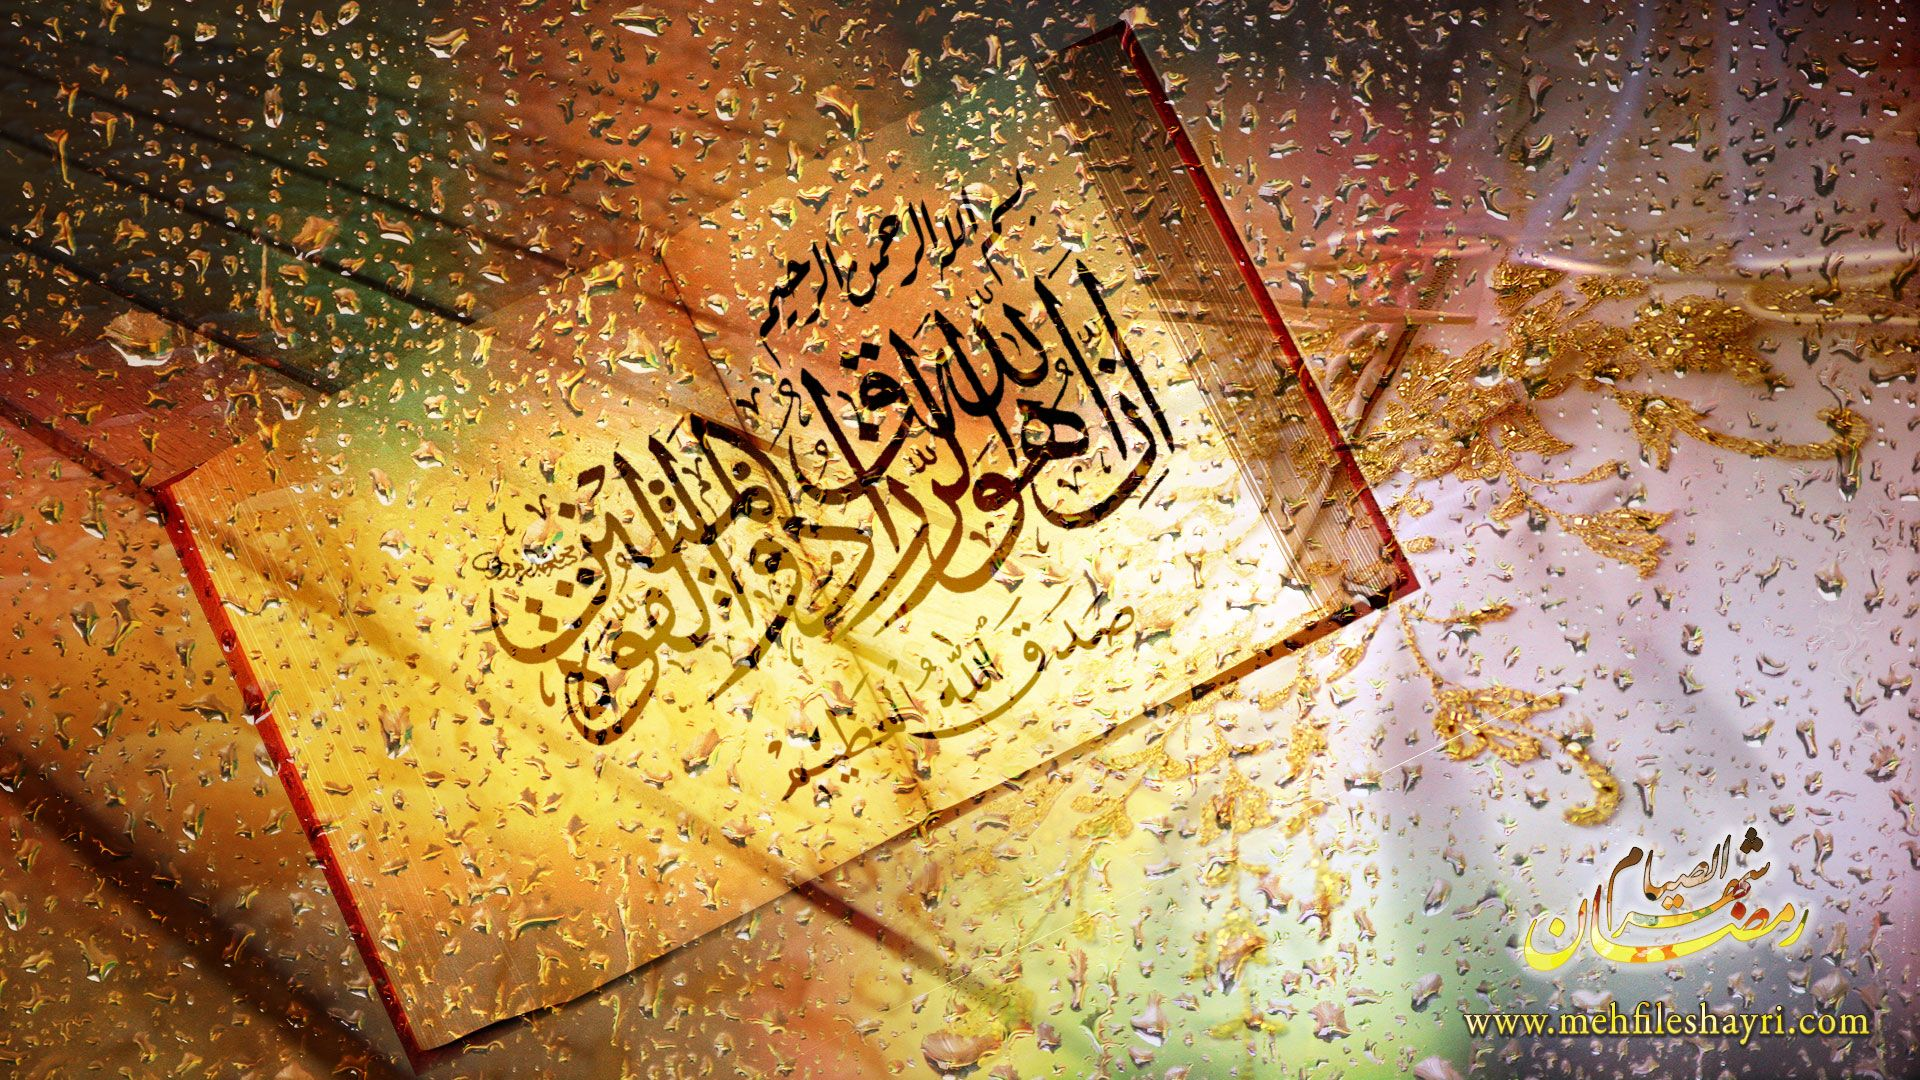 Mehfileshayri Com Ramadan Kareem Wallpaper Click Image